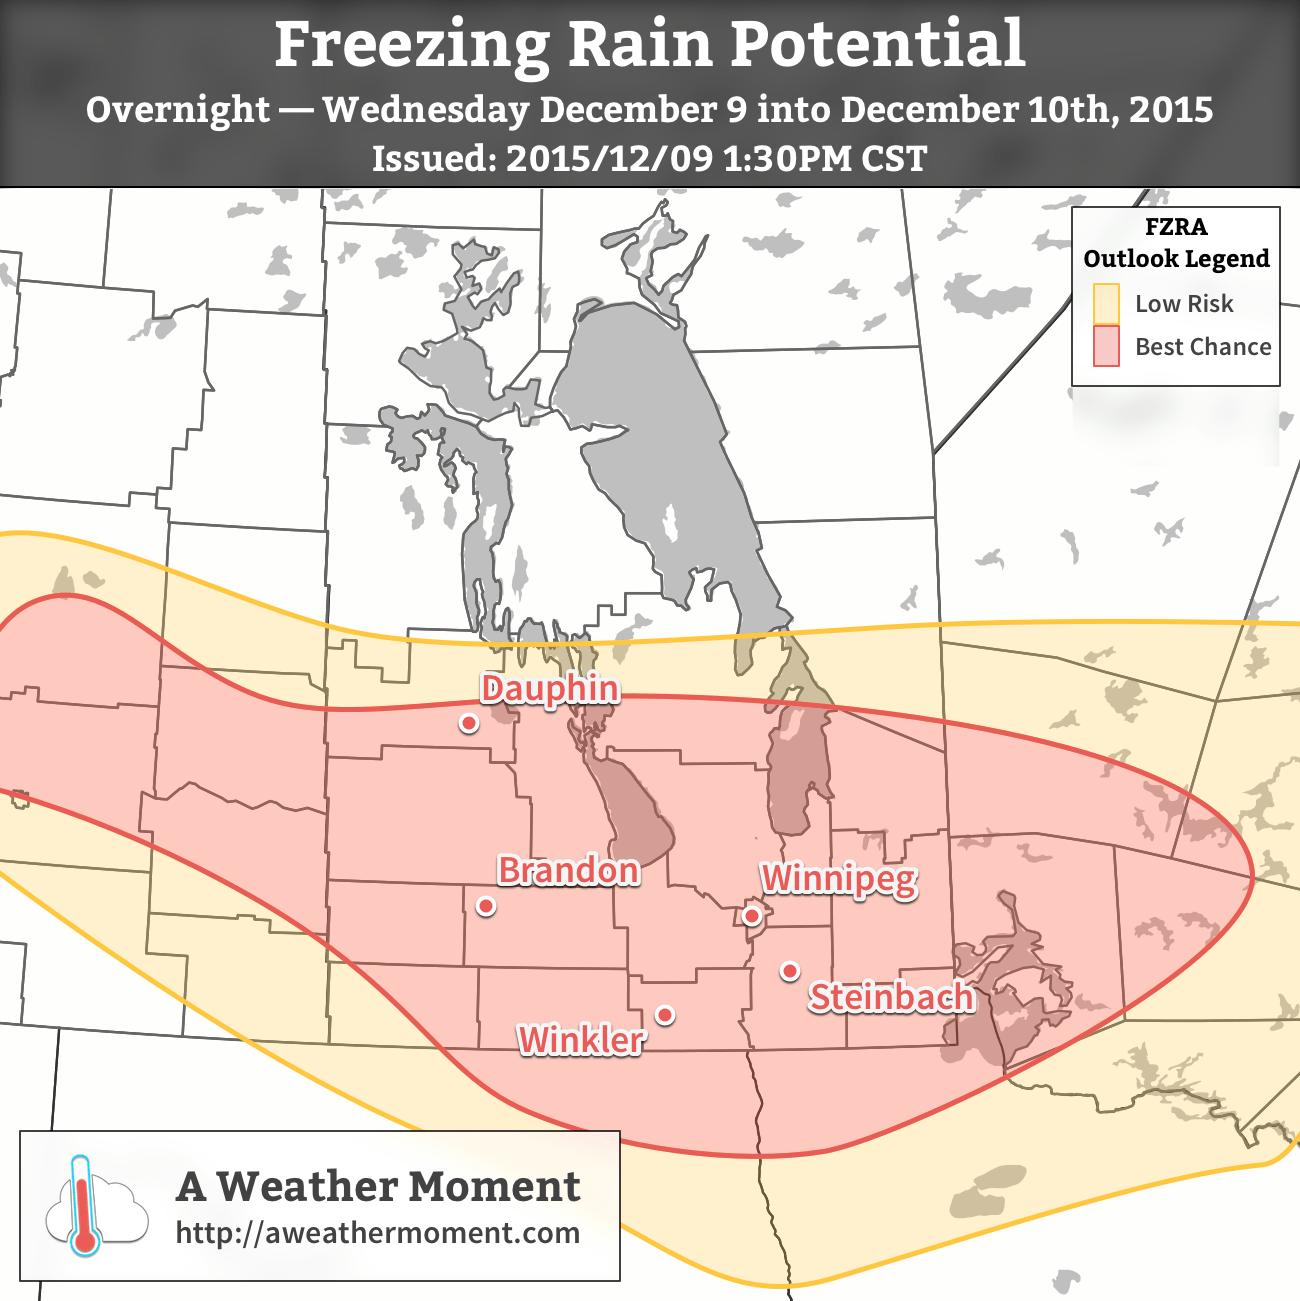 Freezing Rain Potential for December 9-10, 2015